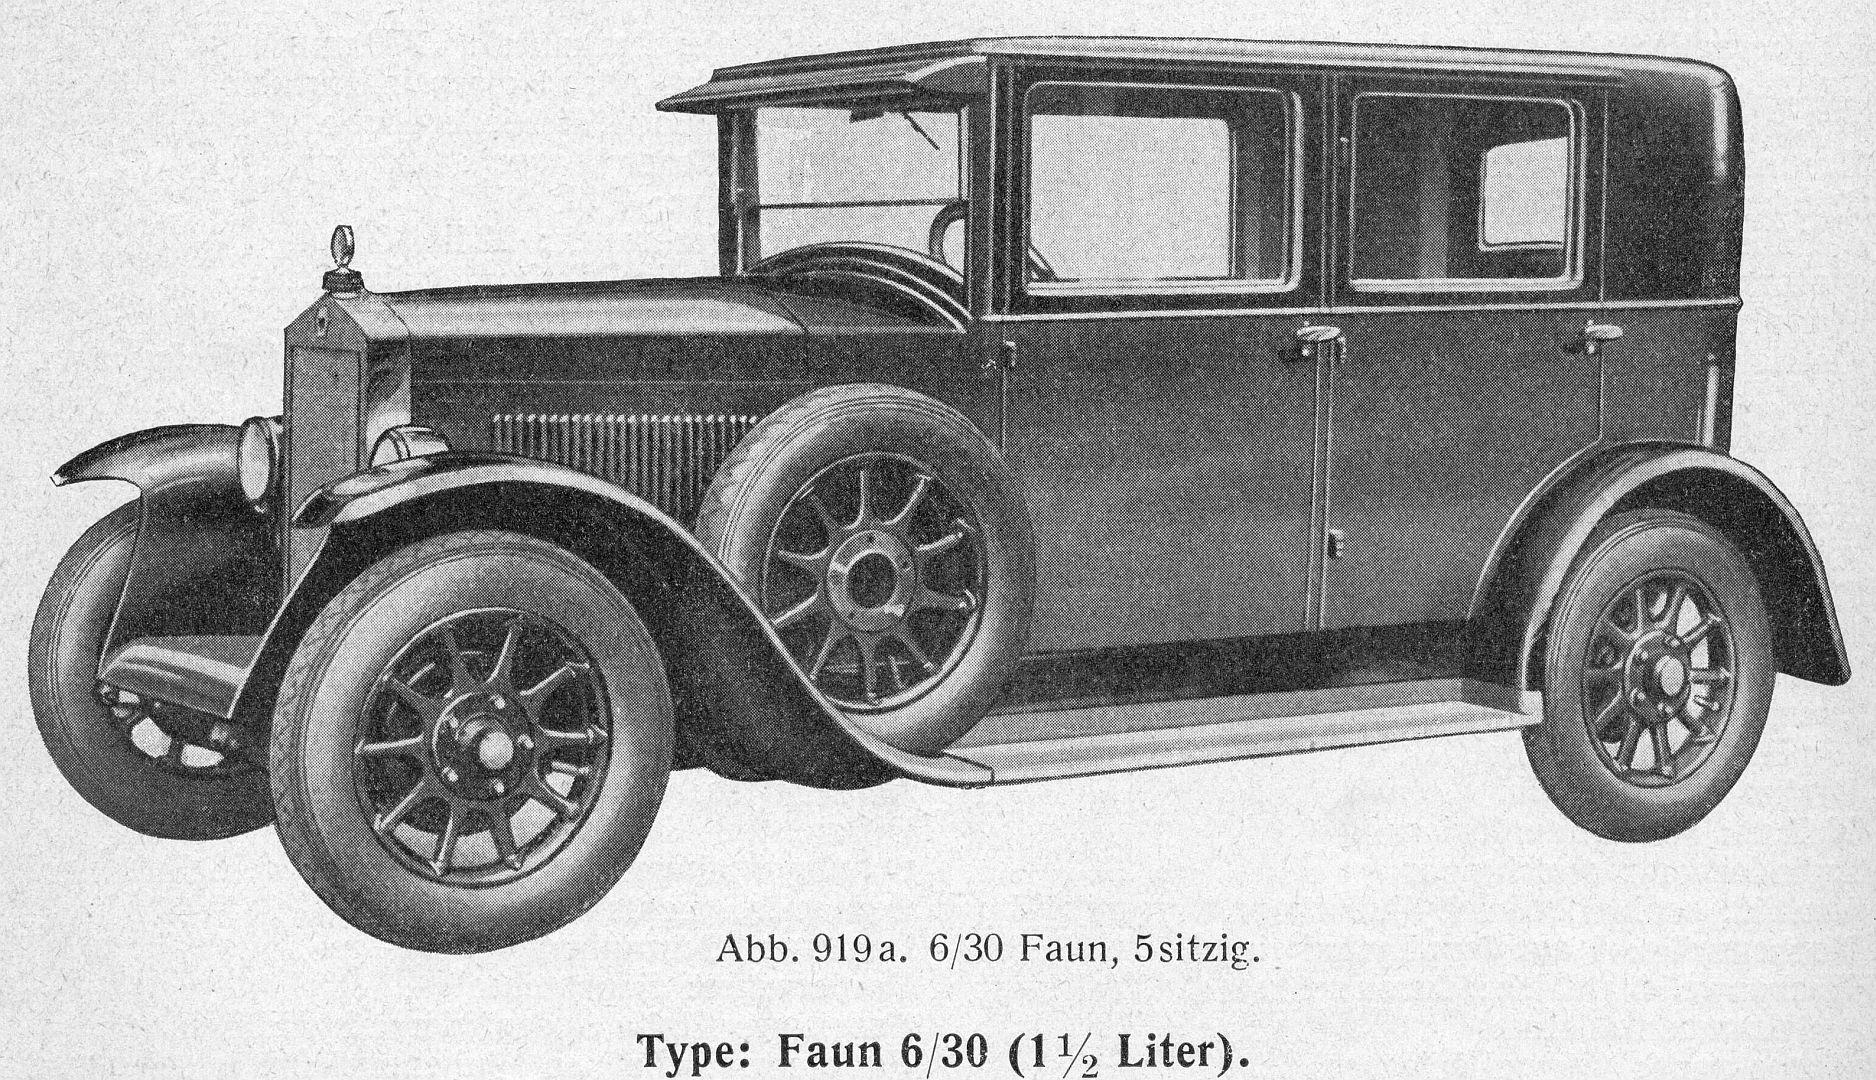 Faun_6-30_PS_Motorfahrzeuge_1928_Galerie